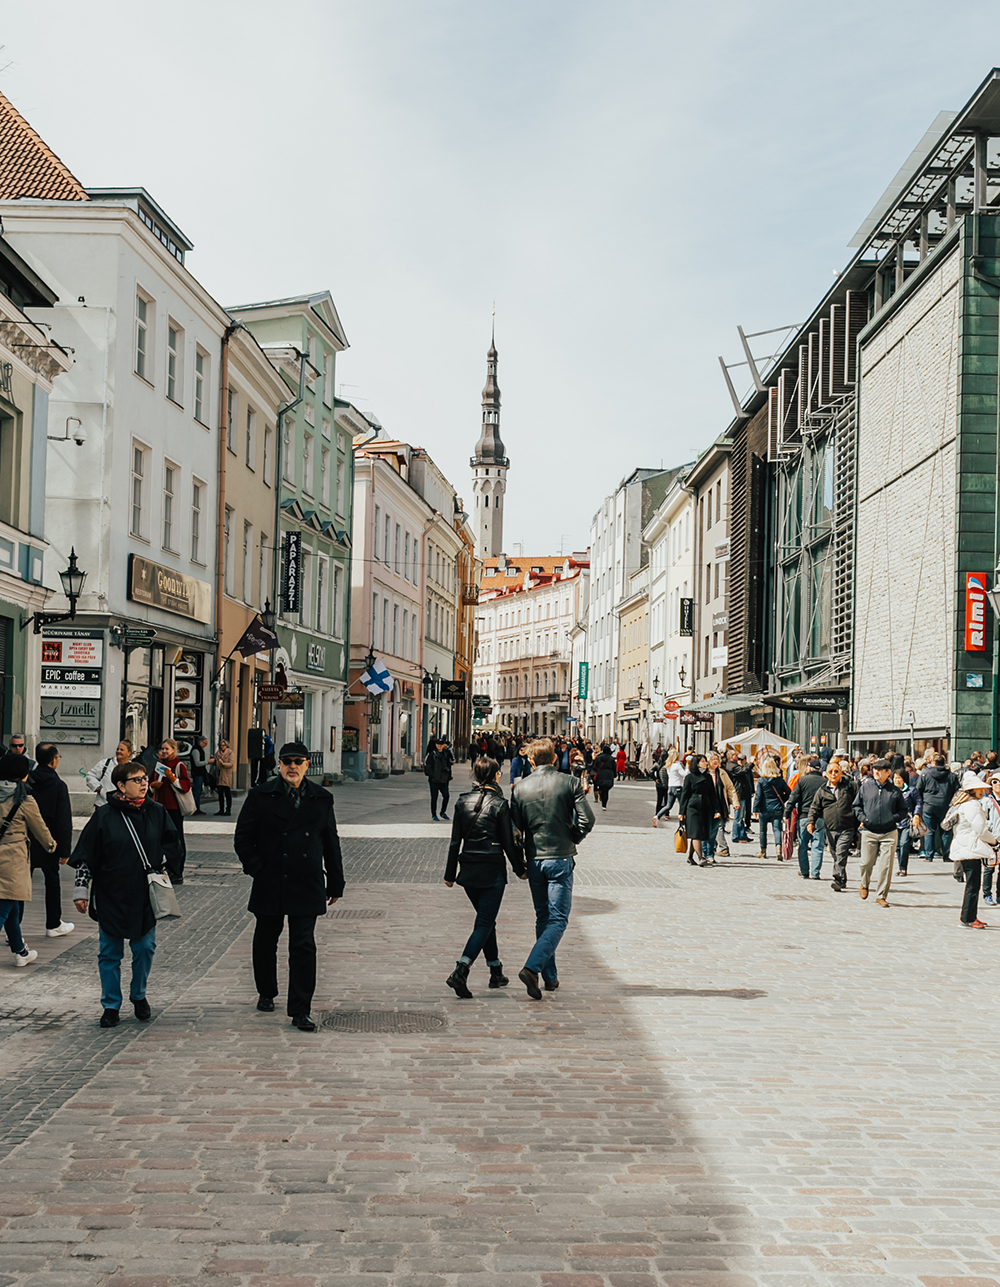 livvyland-blog-olivia-watson-fashion-travel-blogger-princess-cruises-scandinavia-northern-europe-what-to-do-wear-tallinn-estonia-10